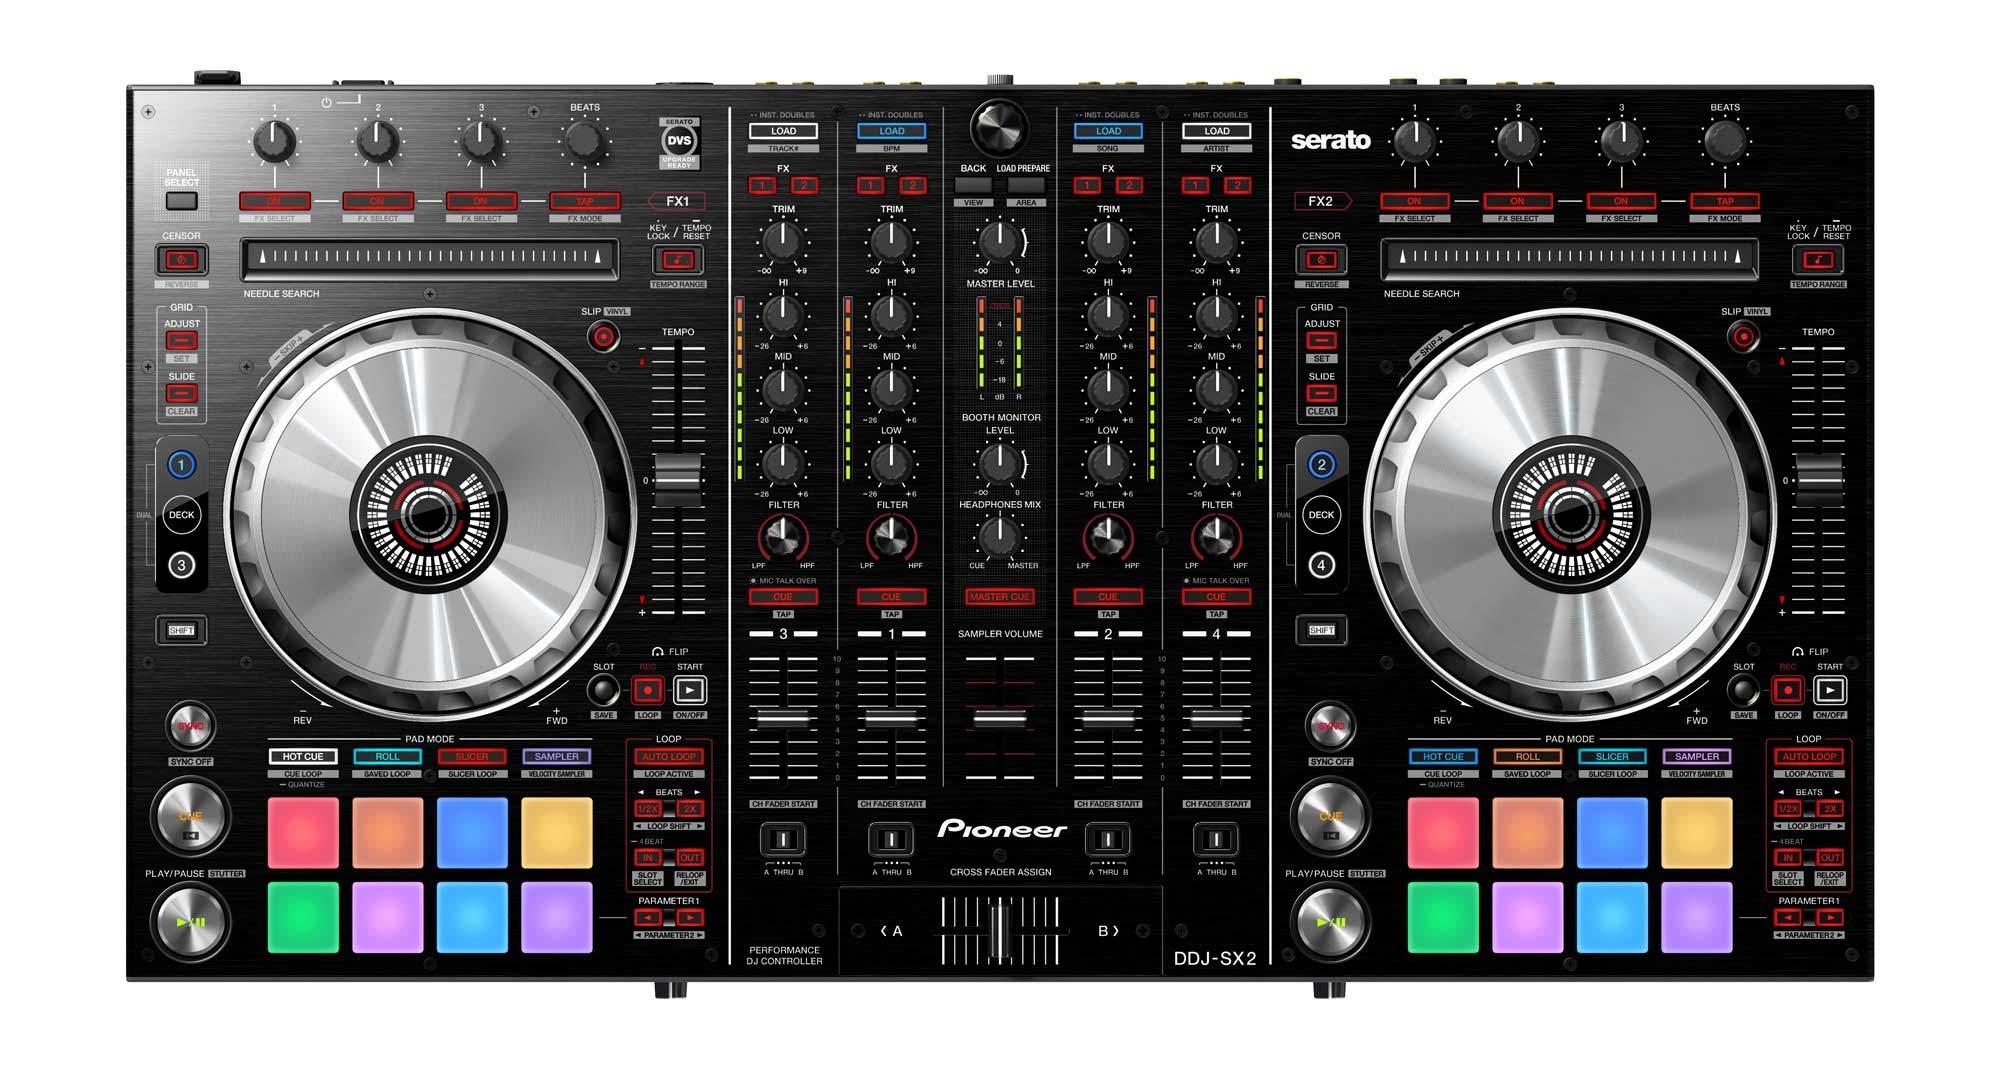 Pioneer DDJ-SX2 serato DJ controller (1)